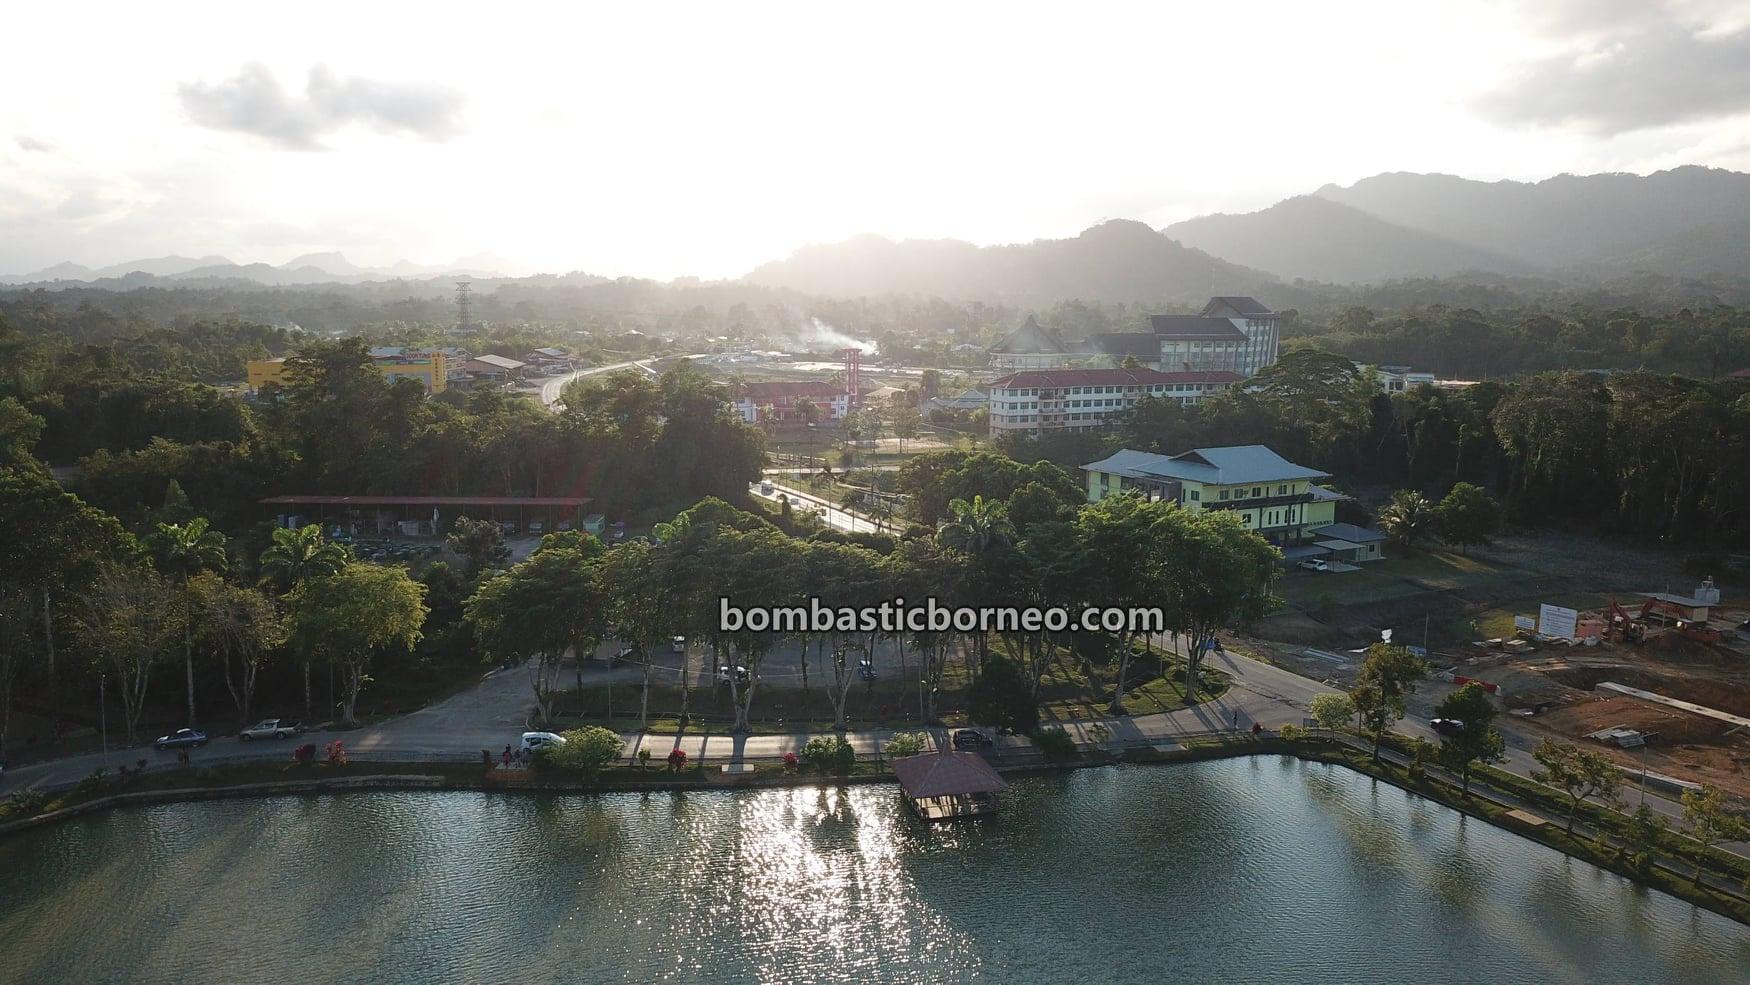 town, Danu Lake, Serian Piazza, destination, exploration, objek wisata, Tourism, tourist attraction, travel guide, Borneo, 探索婆罗洲游踪, 马来西亚, 砂拉越西连,